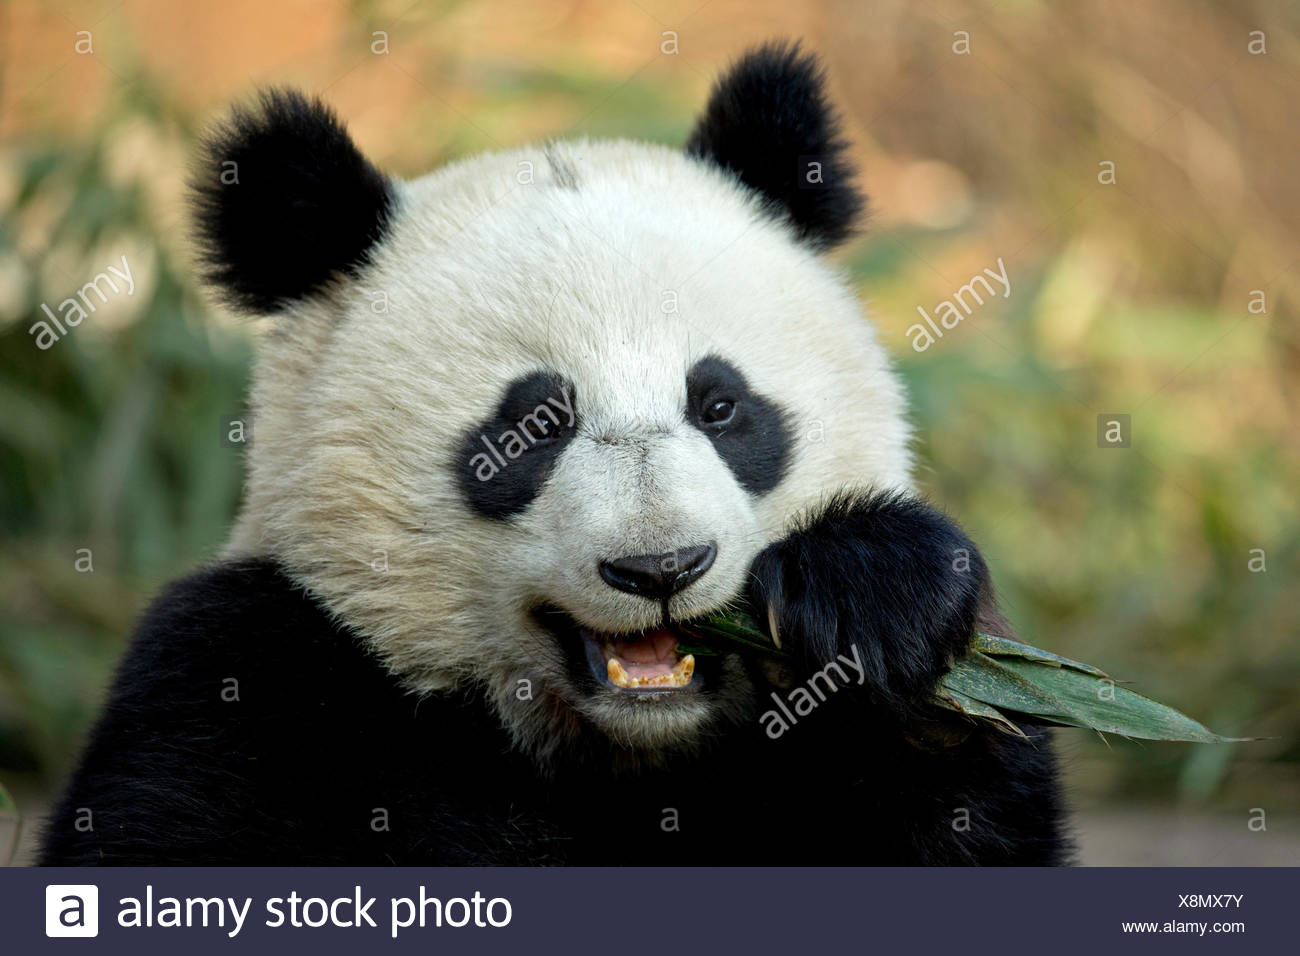 El panda gigante (Ailuropoda melanoleuca) sub adulto alimentándose. Bifengxia, China. Cautivos. Imagen De Stock